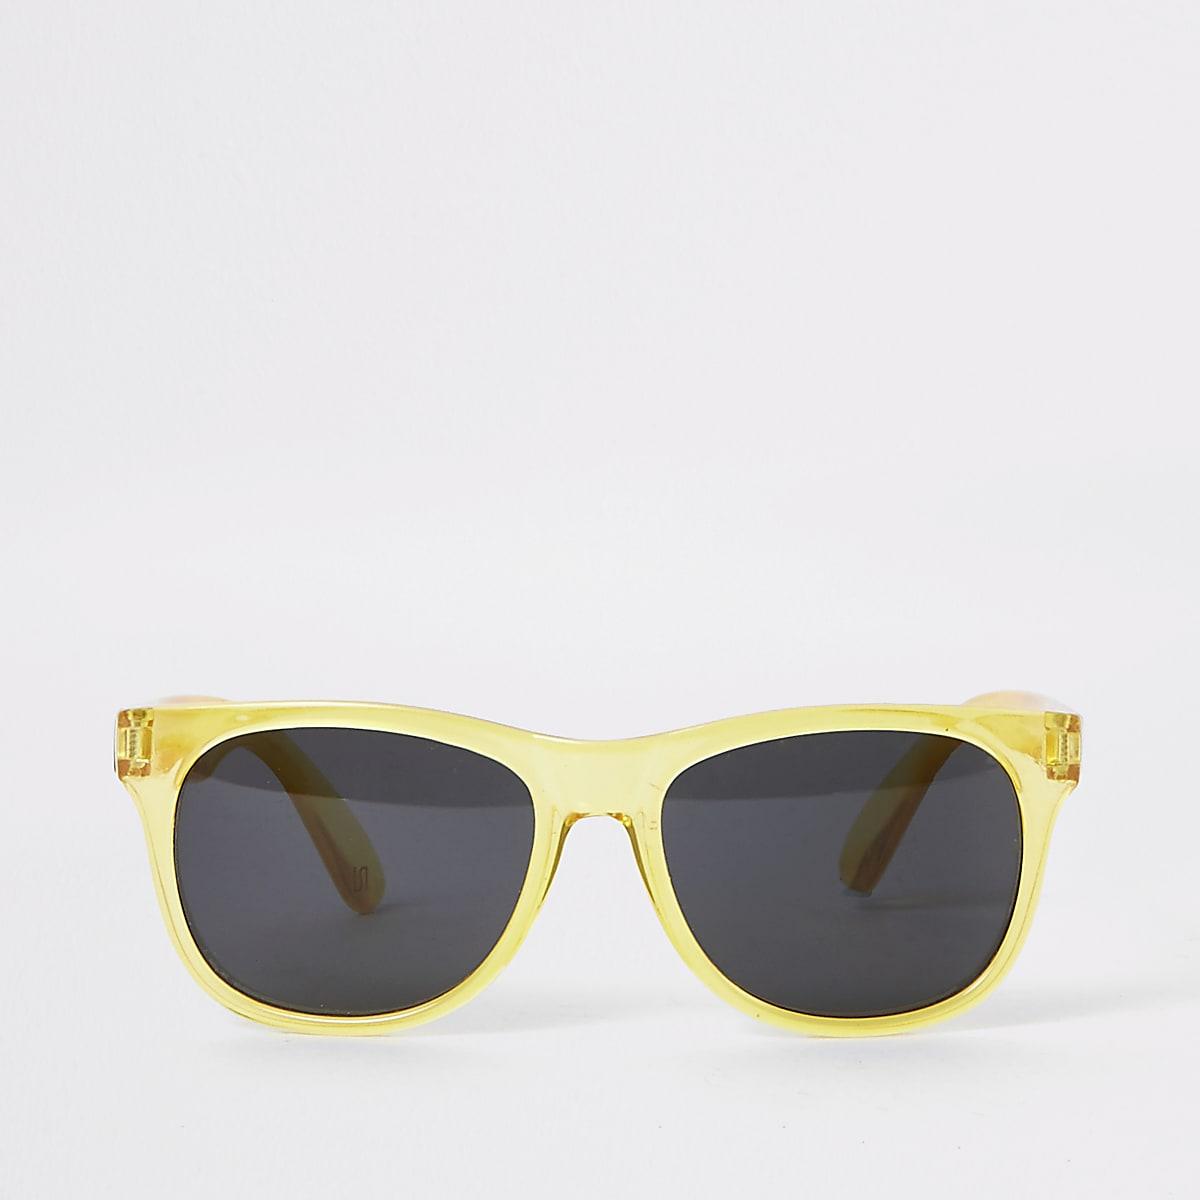 Boys yellow retro sunglasses